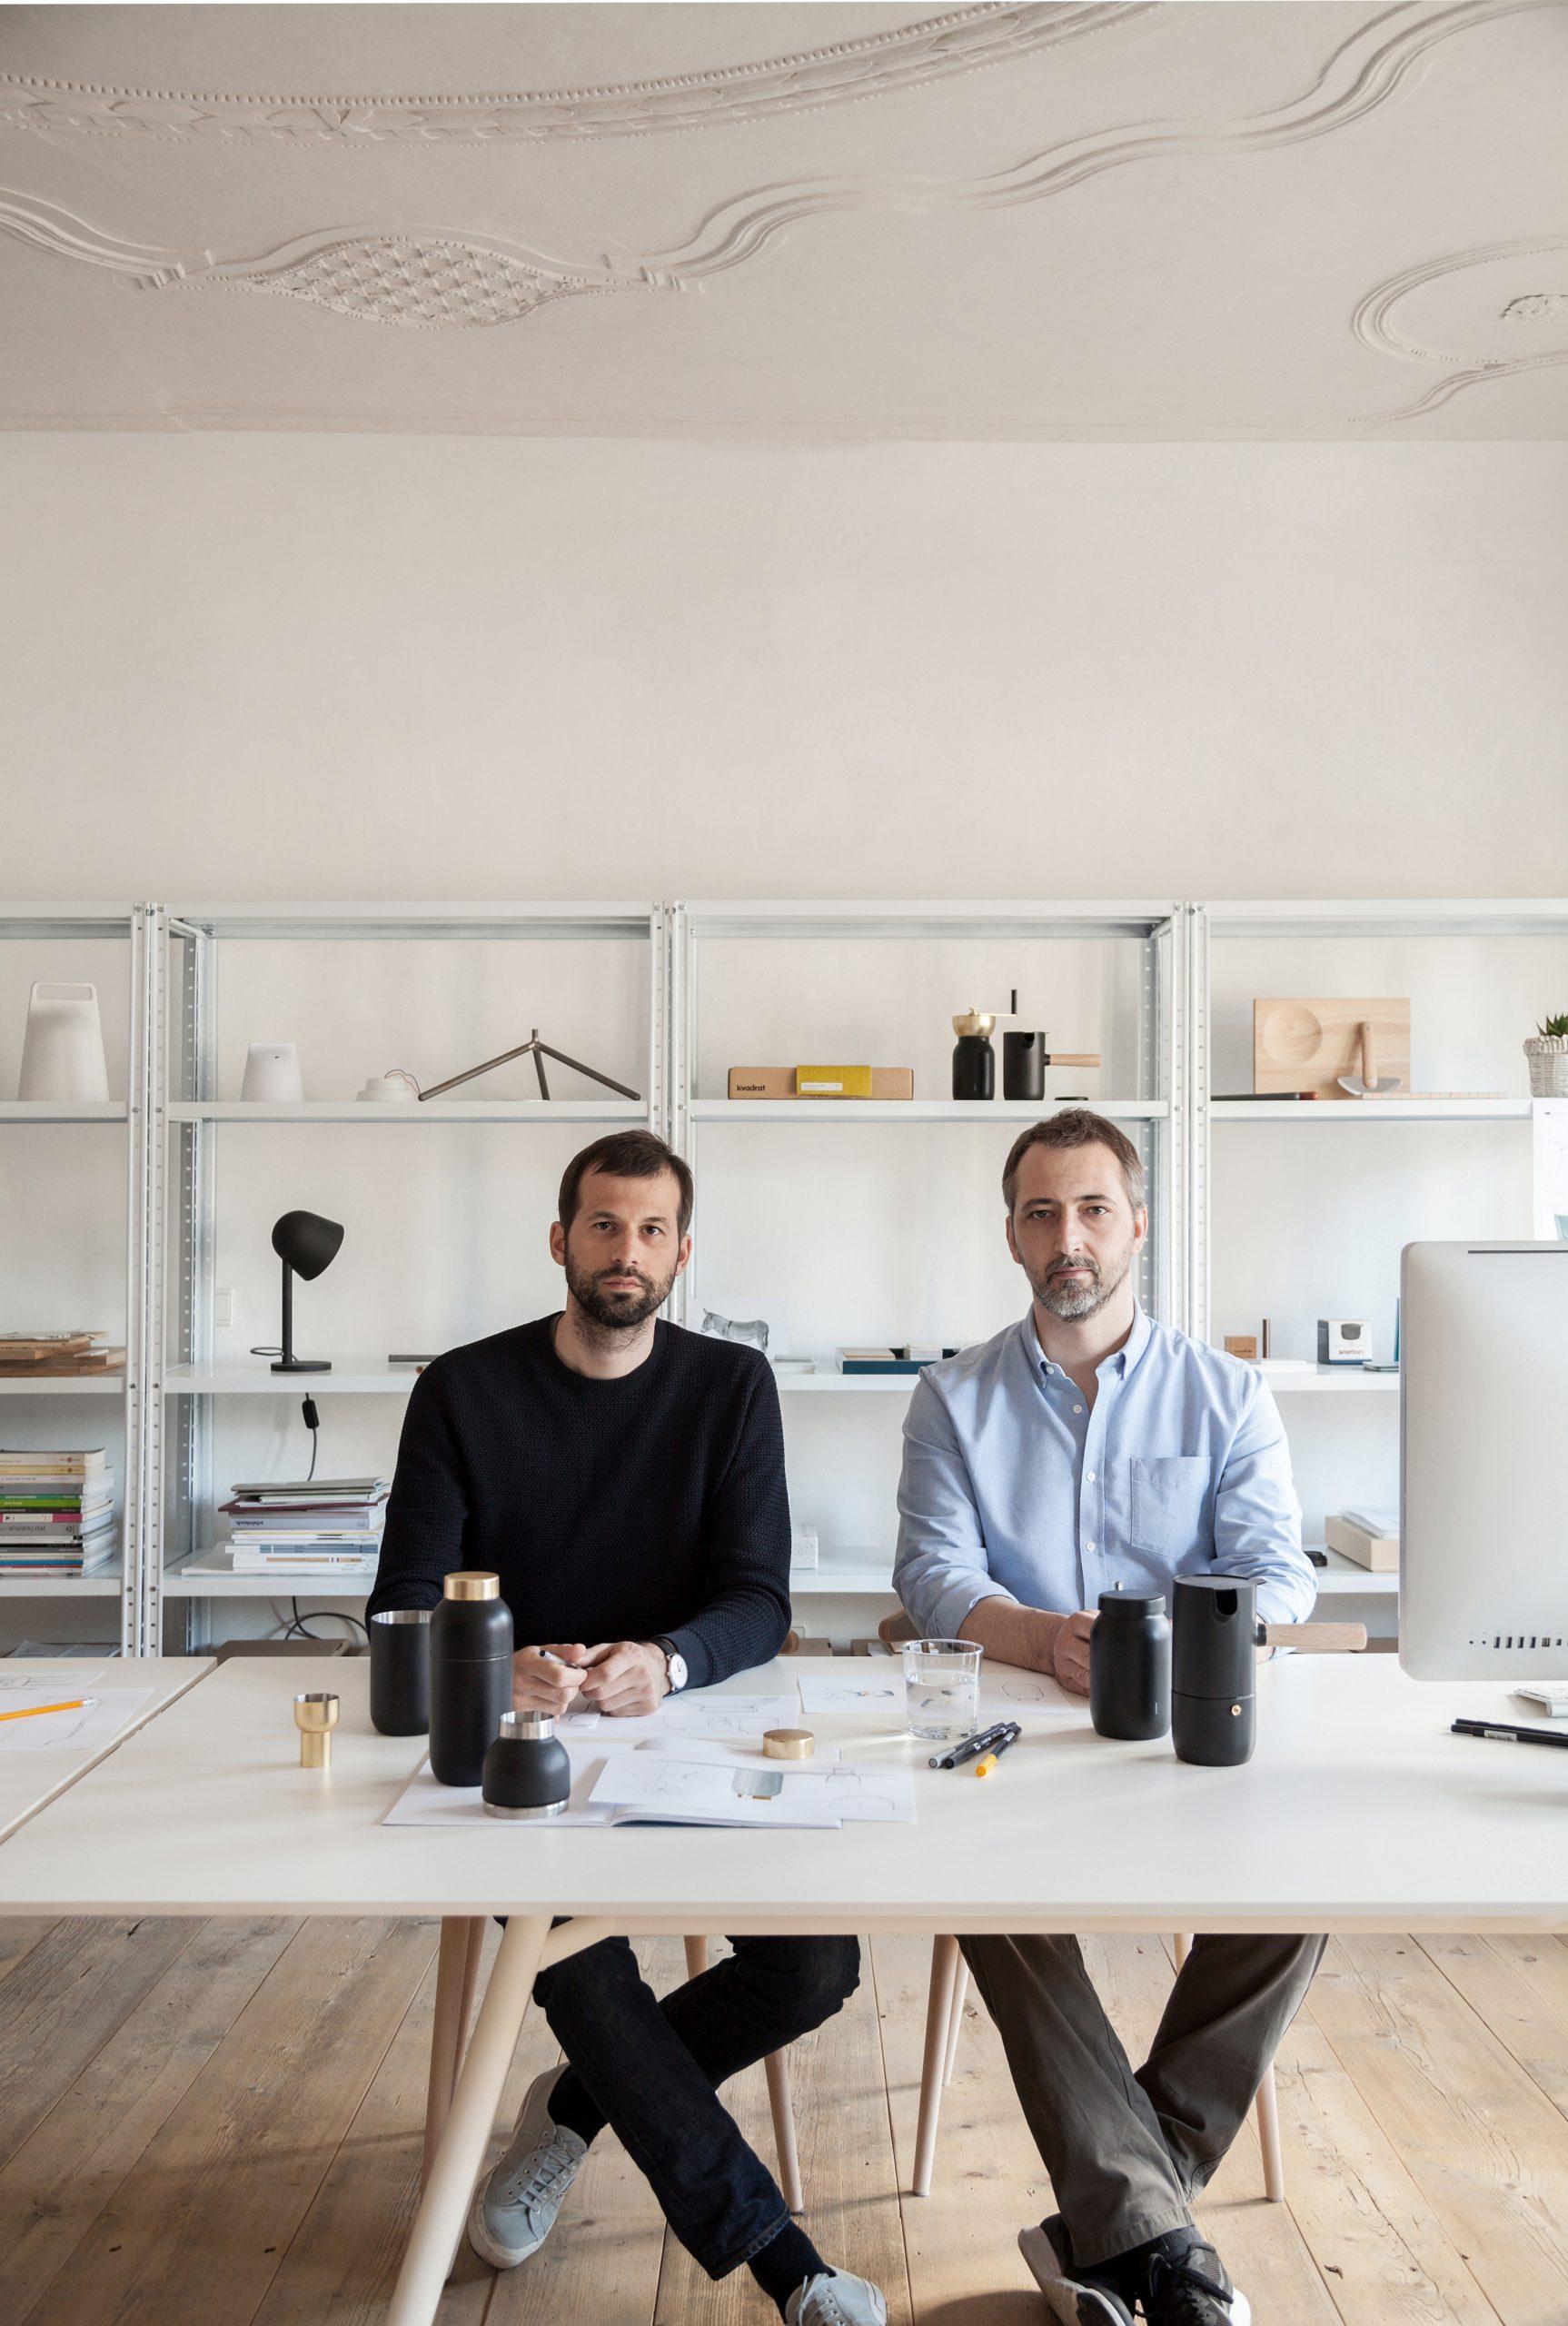 Studio shot of Daniel Debiasi and Federico sandri with the Collar bar set designed for Stelton